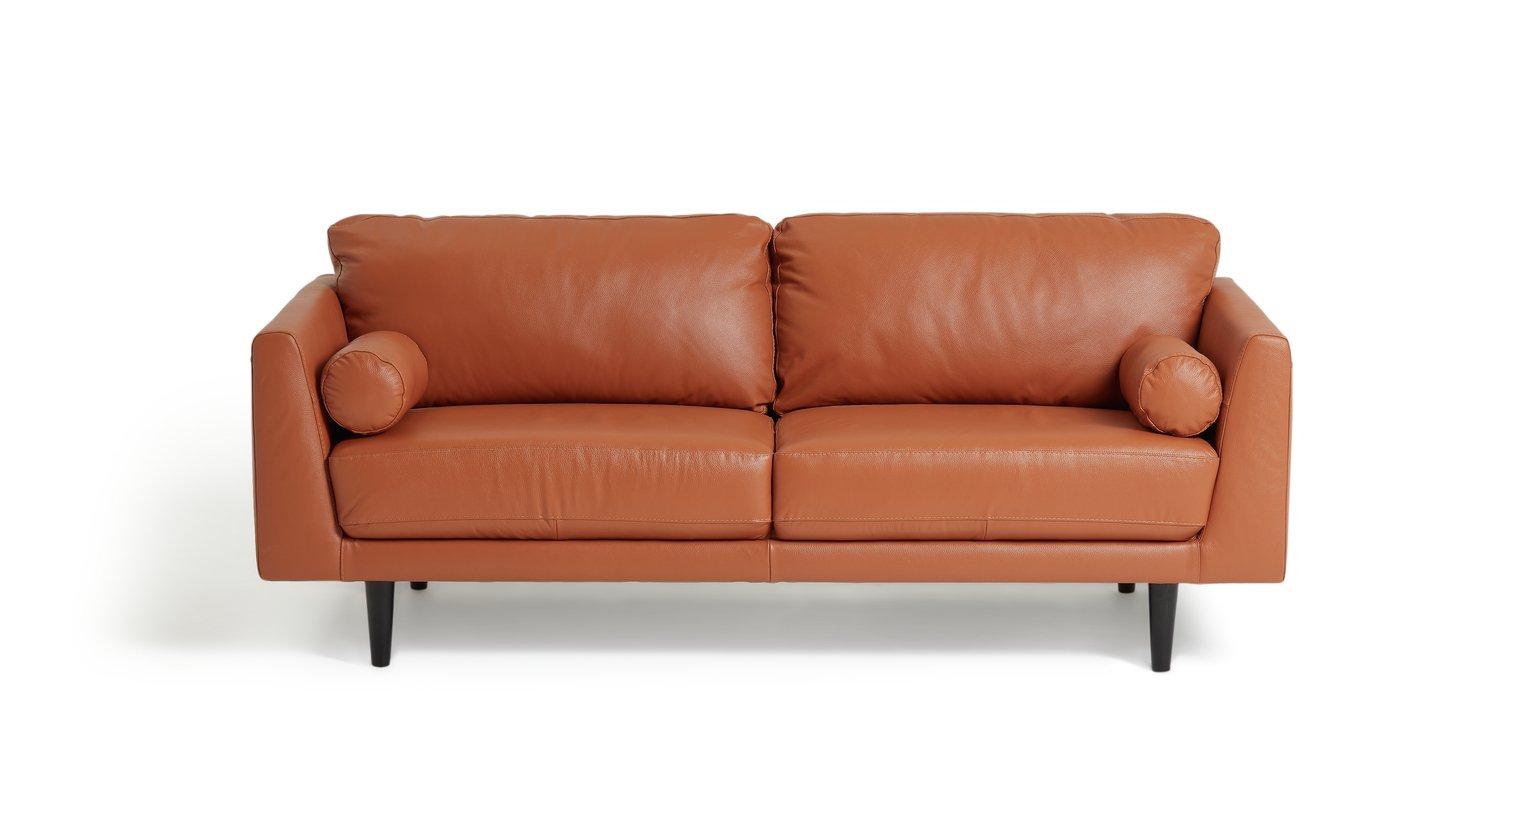 Habitat Jackson 3 Seater Leather Sofa - Tan